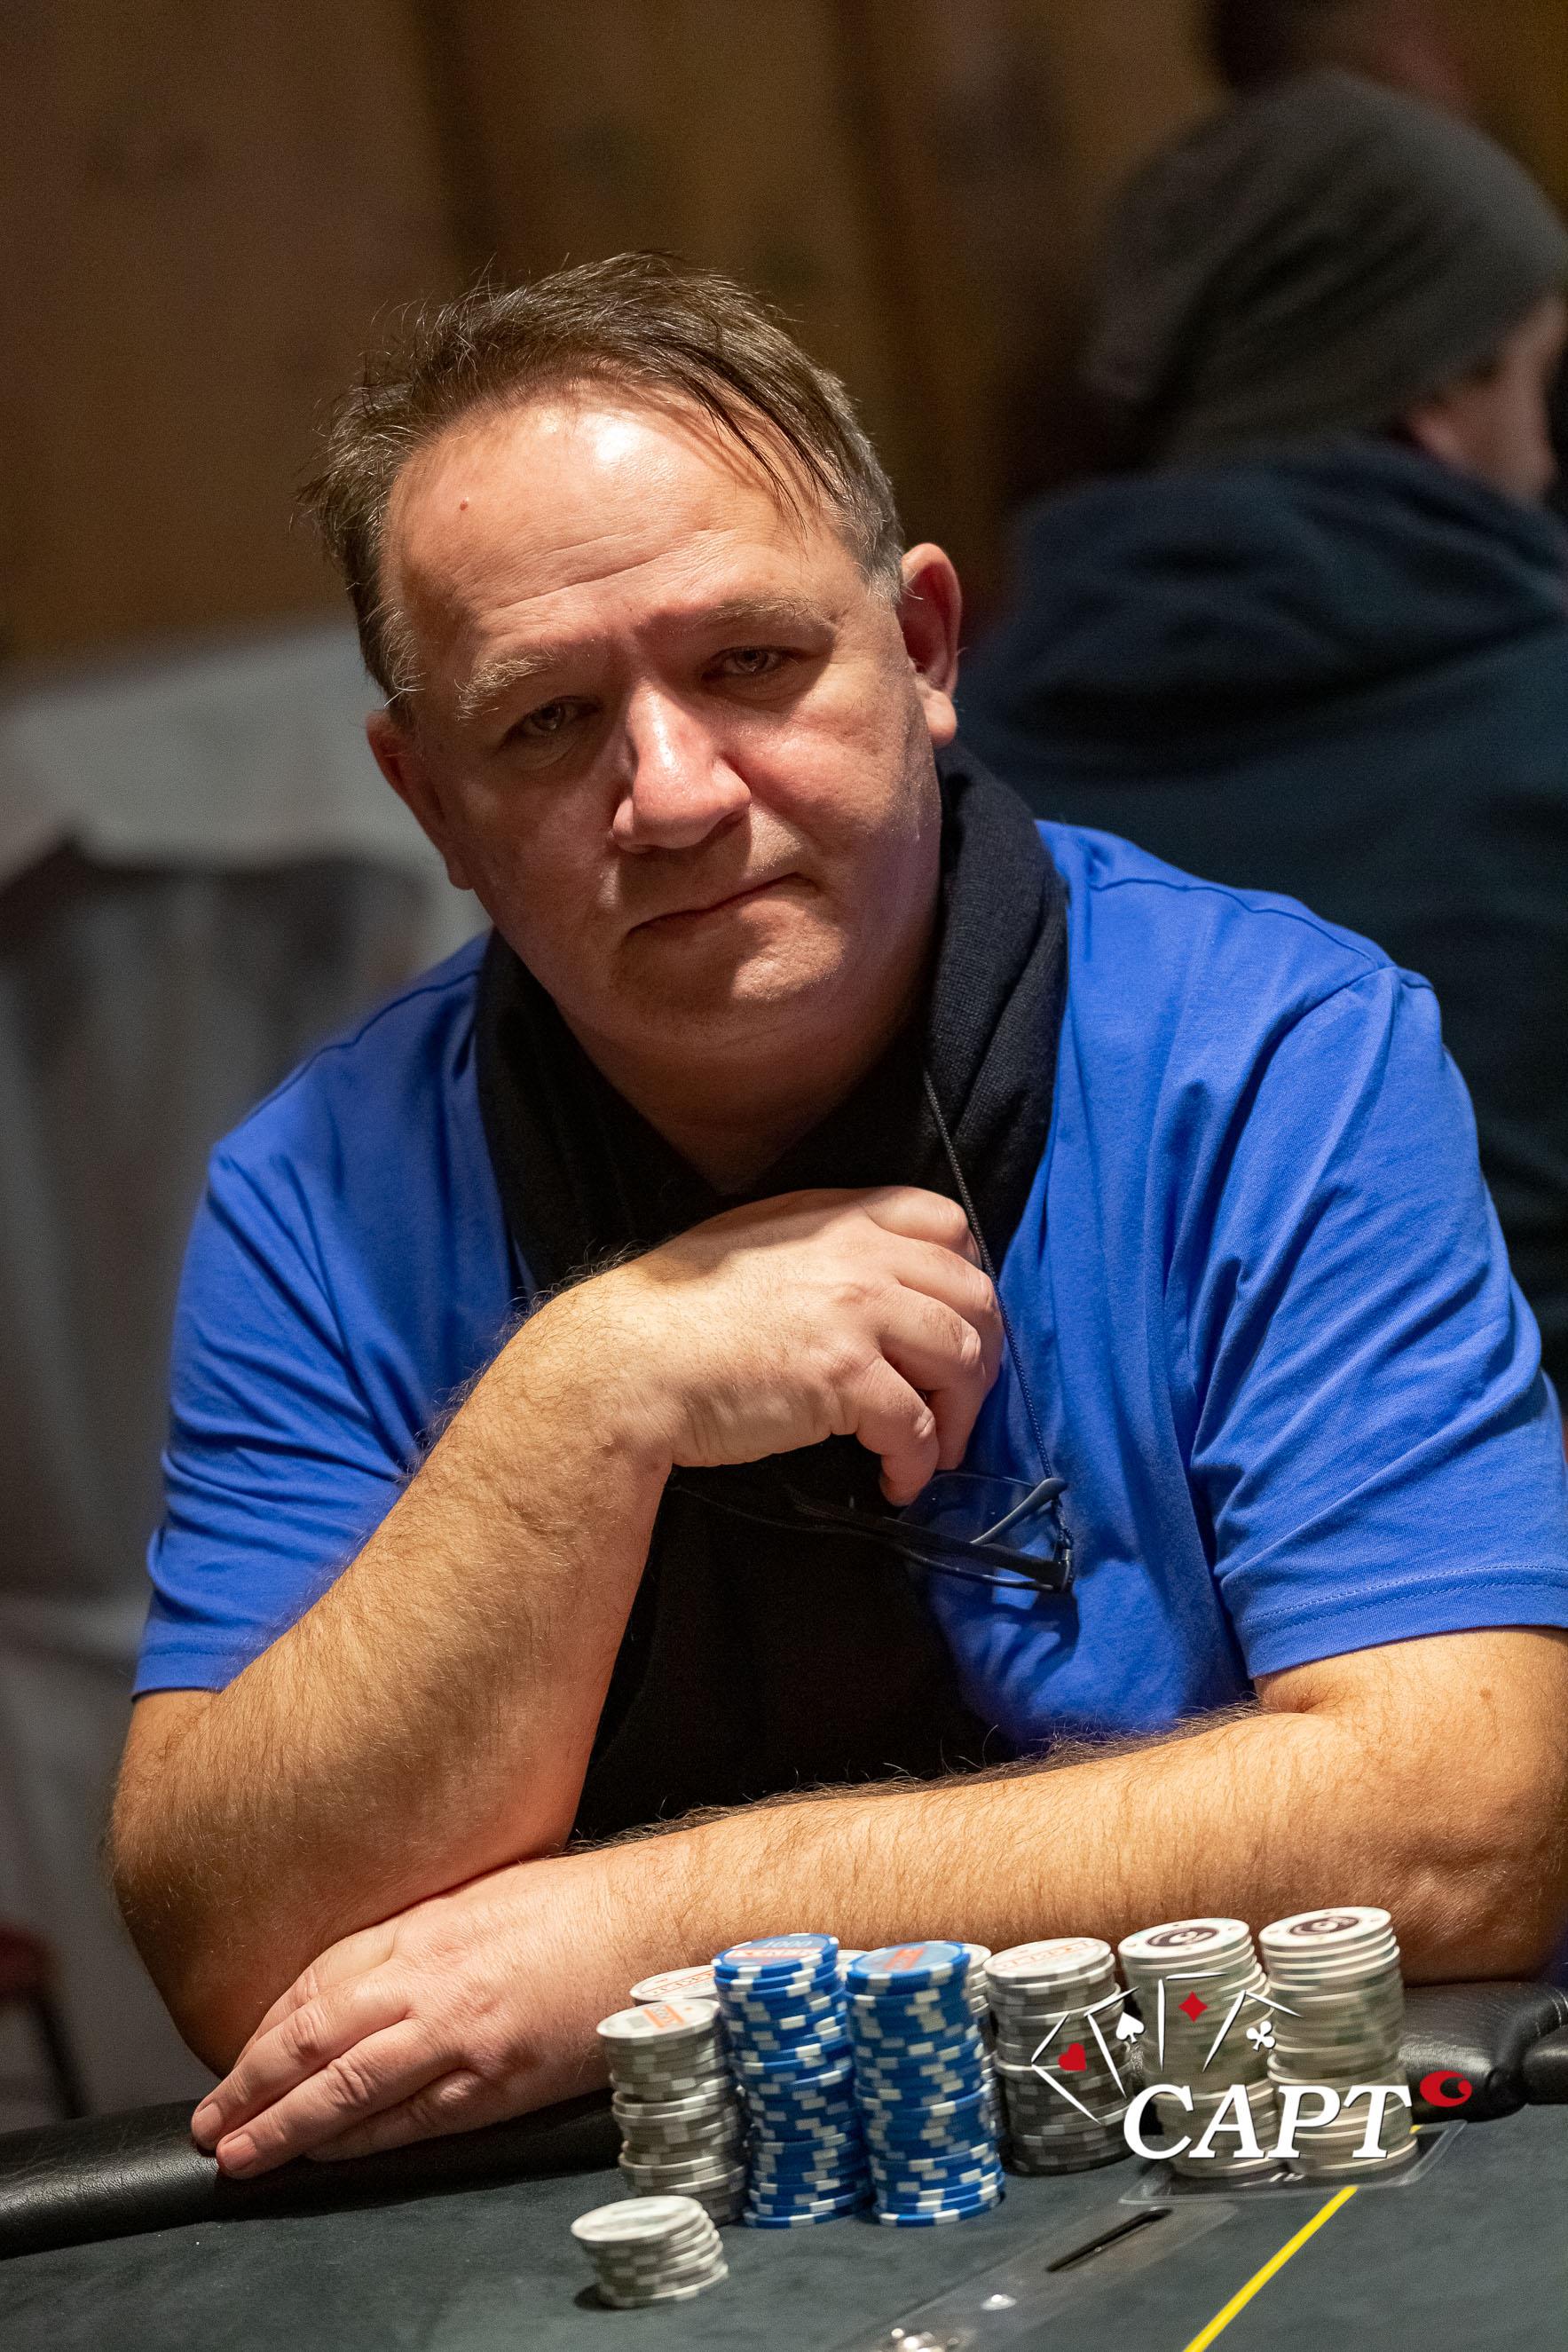 internet poker app casino echtgeld automaten spielhalle